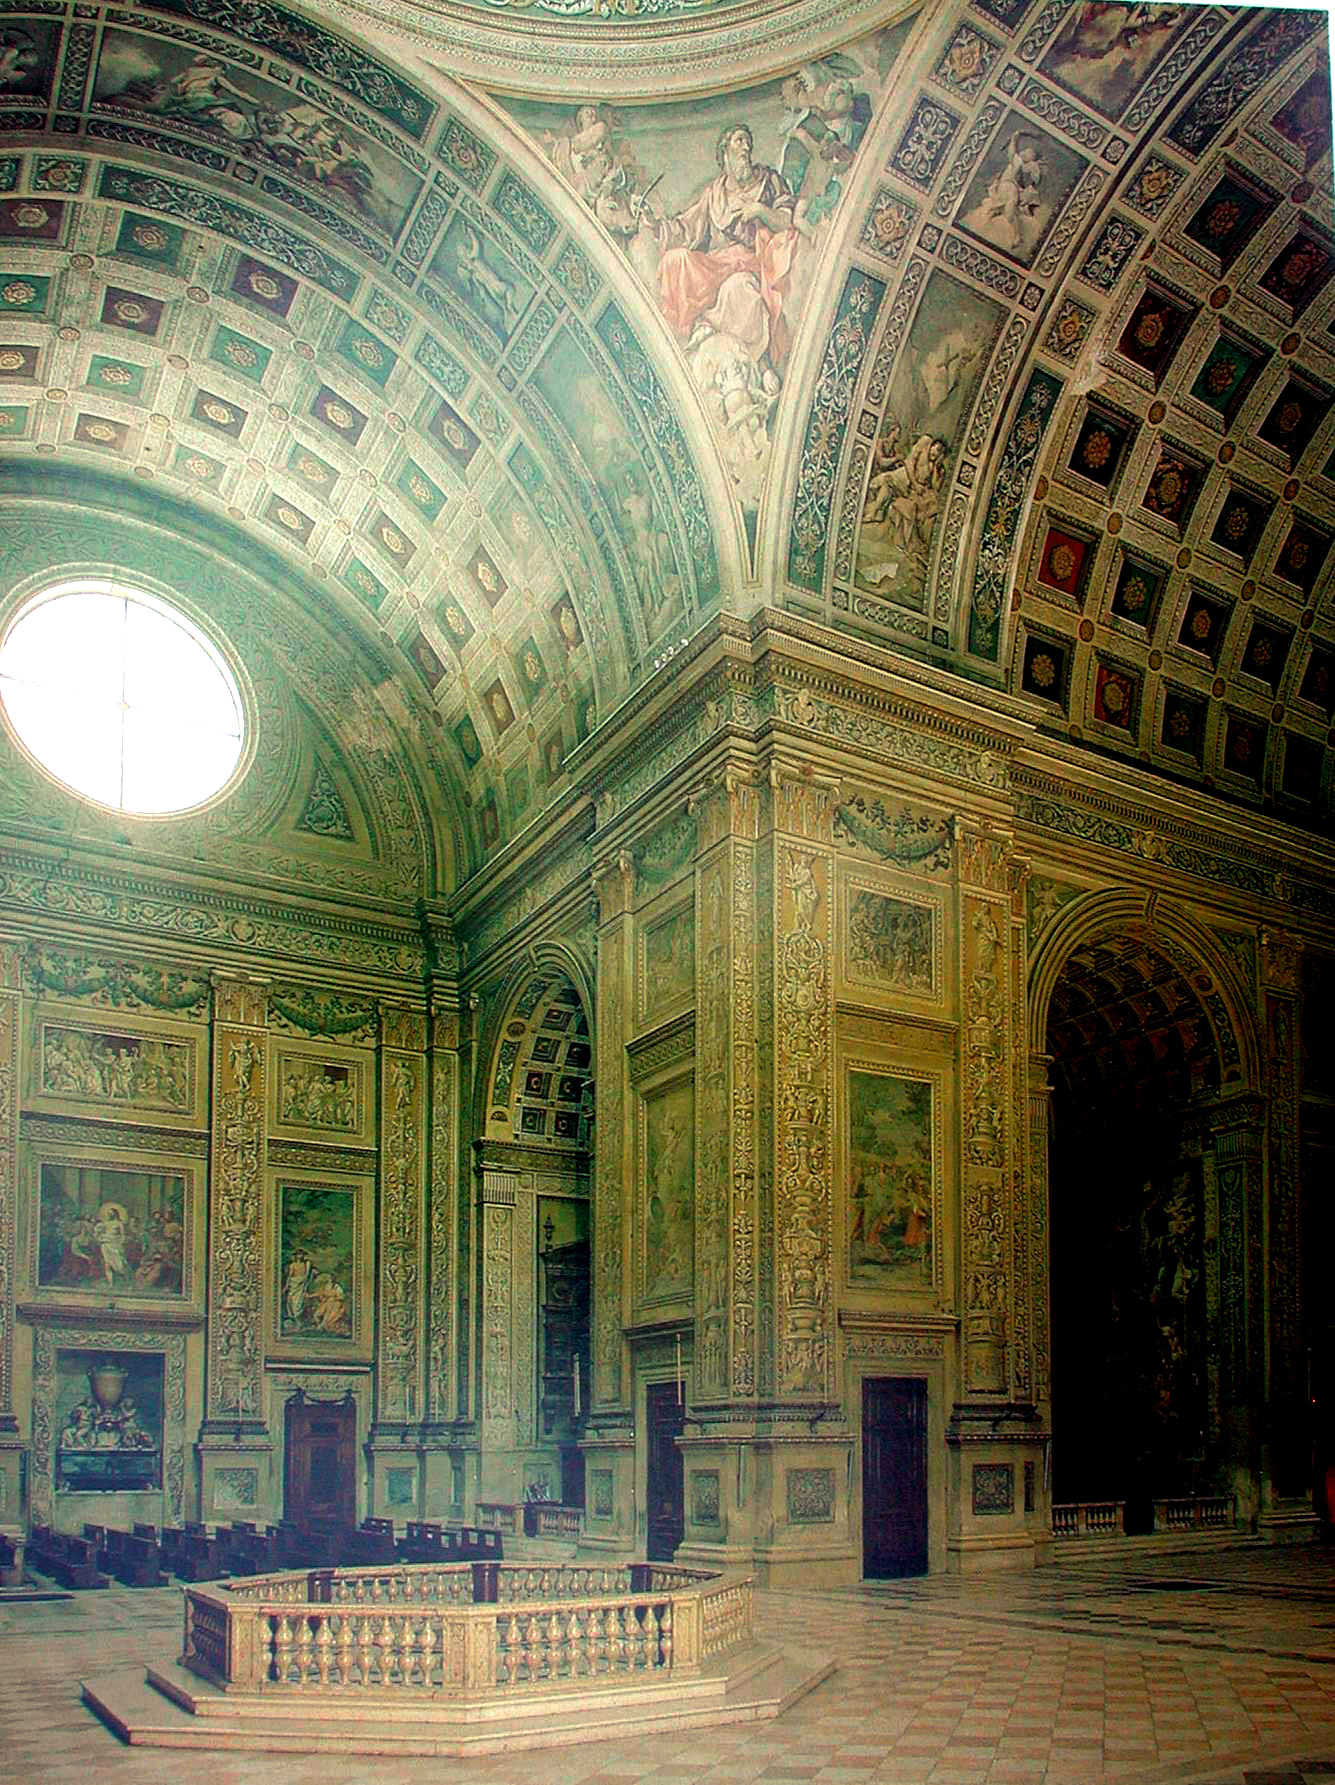 Alberti san andr s de mantua interior jpg 711027 bytes - Mantua bagni catalogo ...